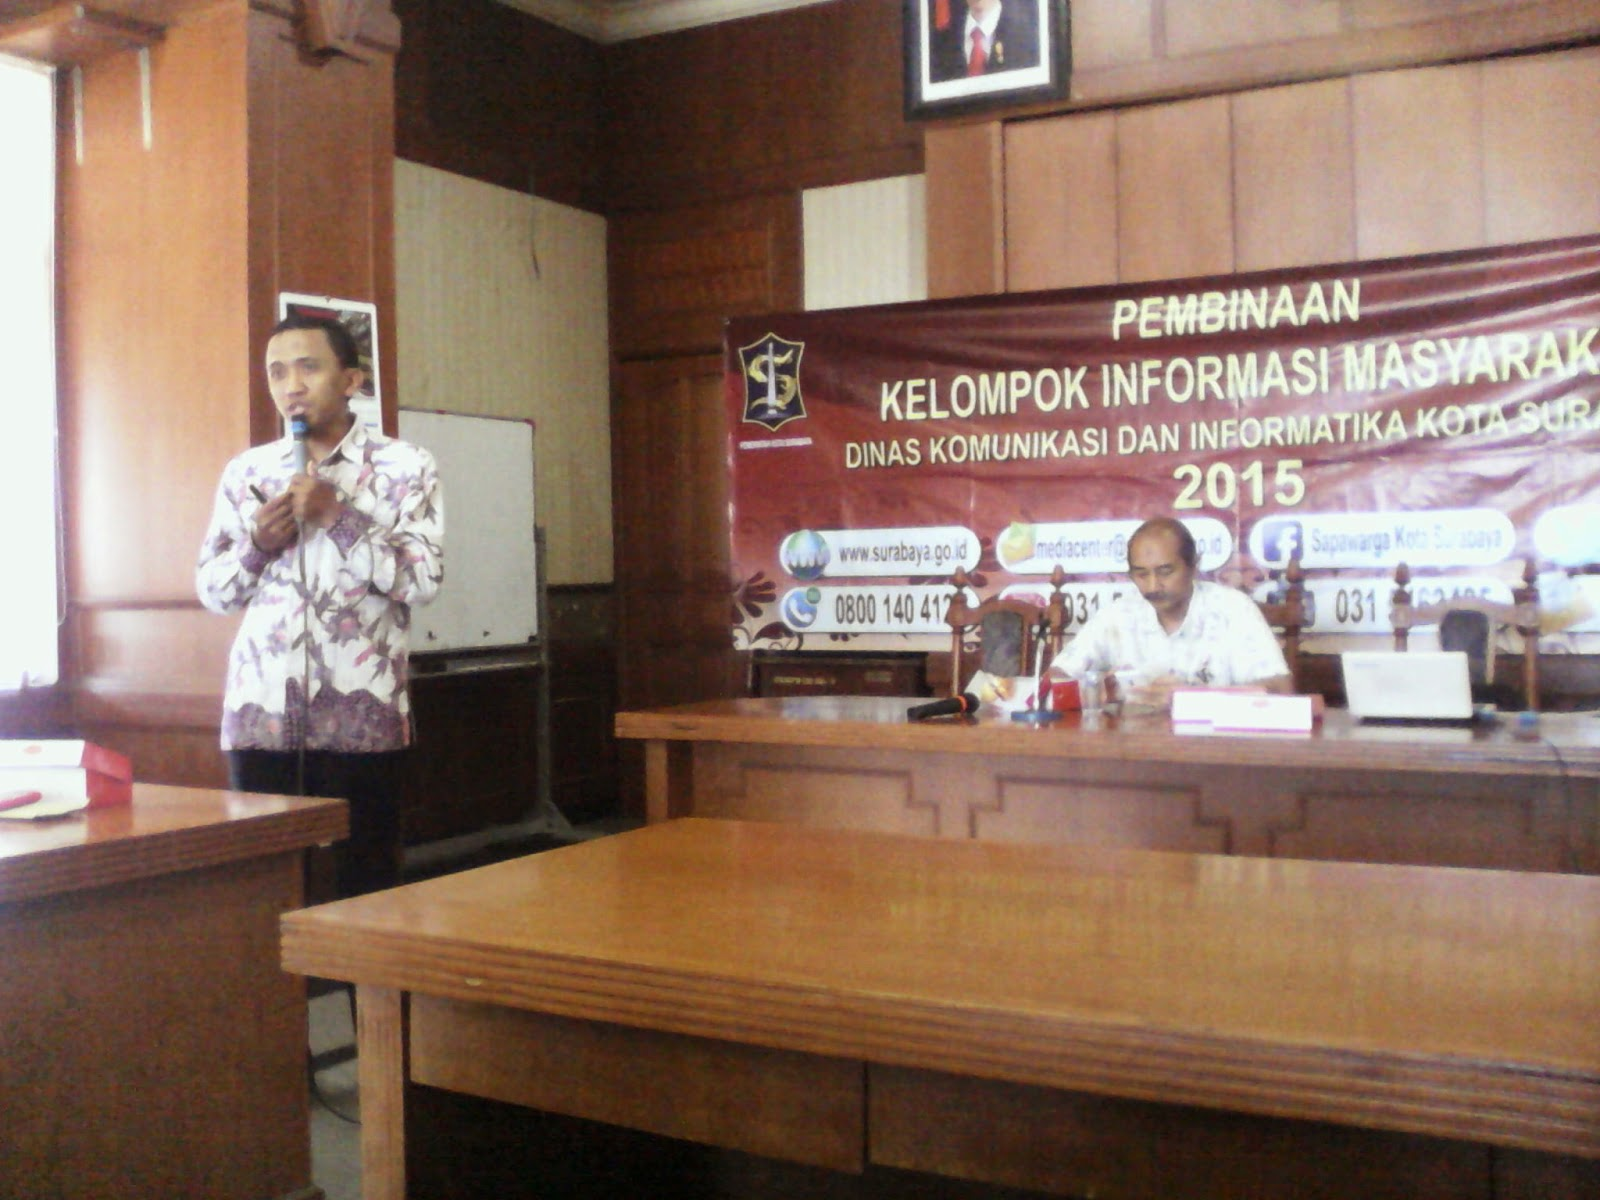 Pembentukan Paguyuban KIM Surabaya